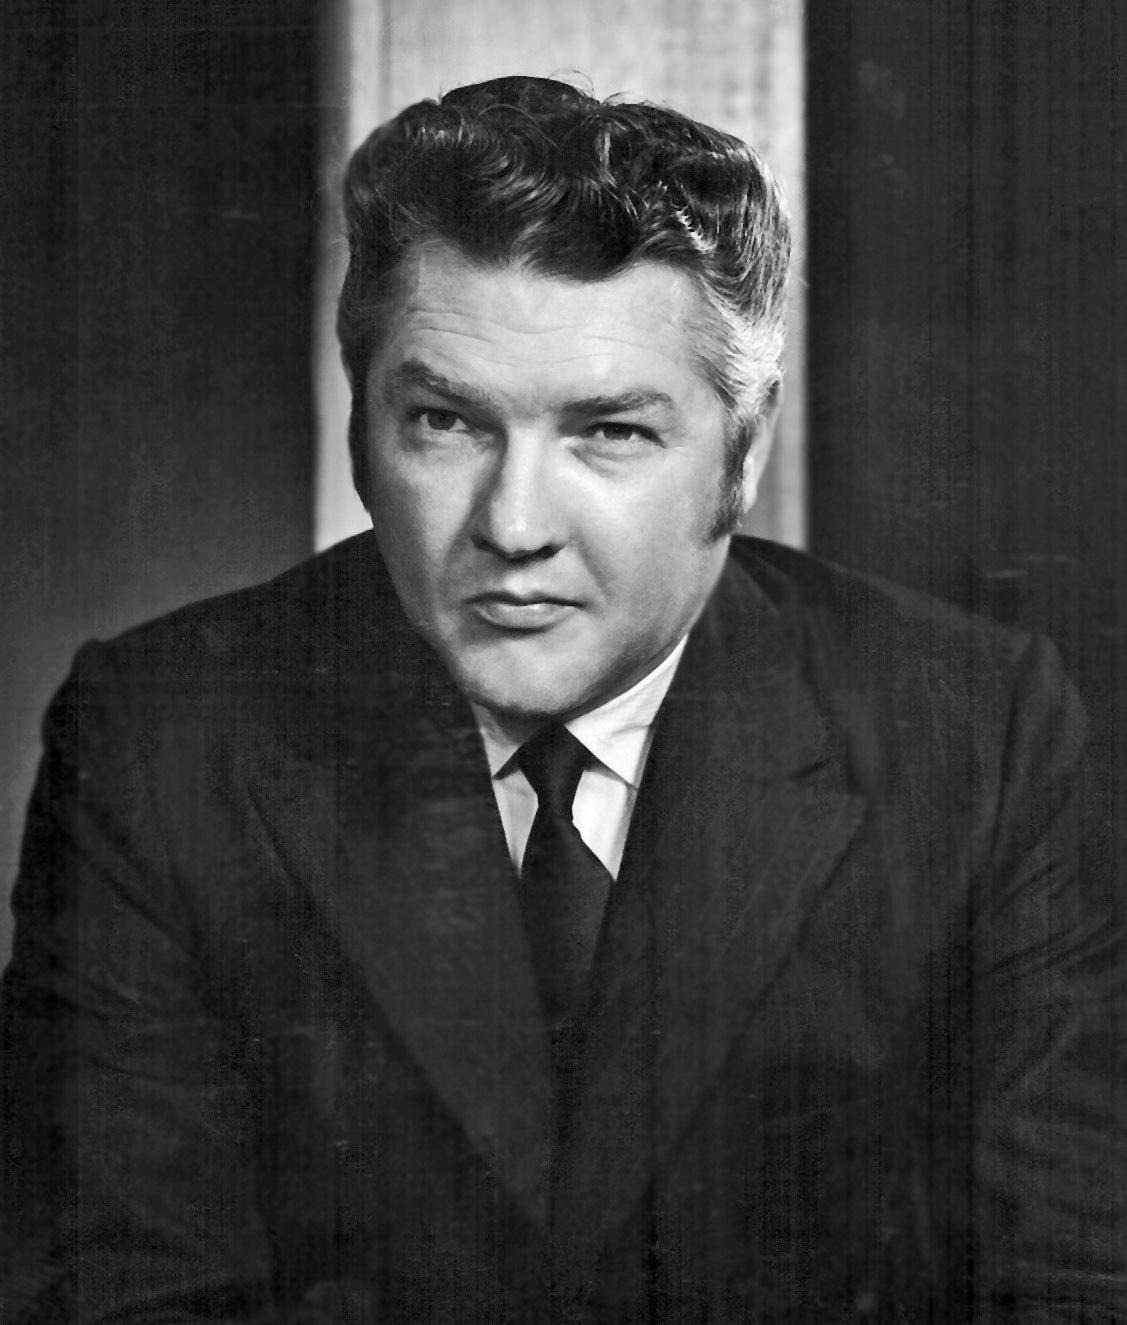 GEORGE E. ISAACS SR.